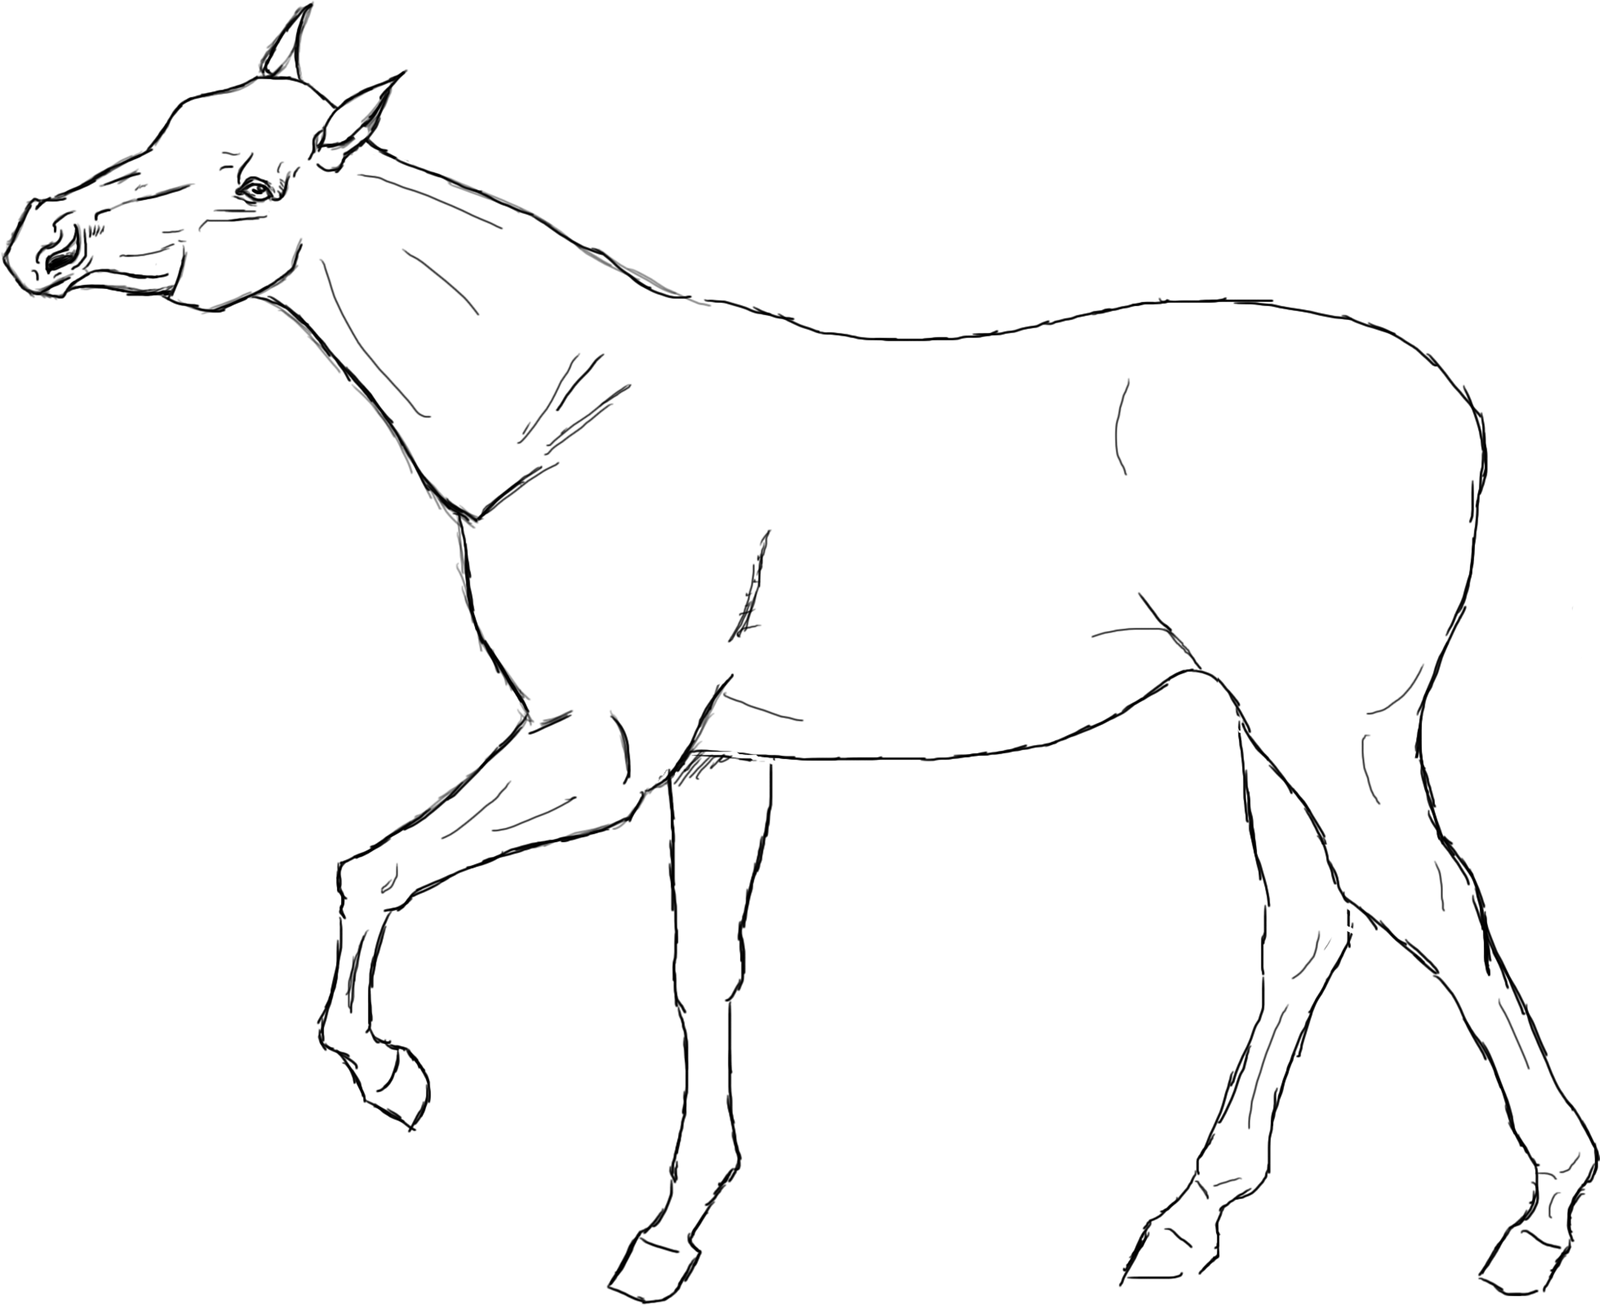 Horse Lineart : Horse lineart by yaku on deviantart